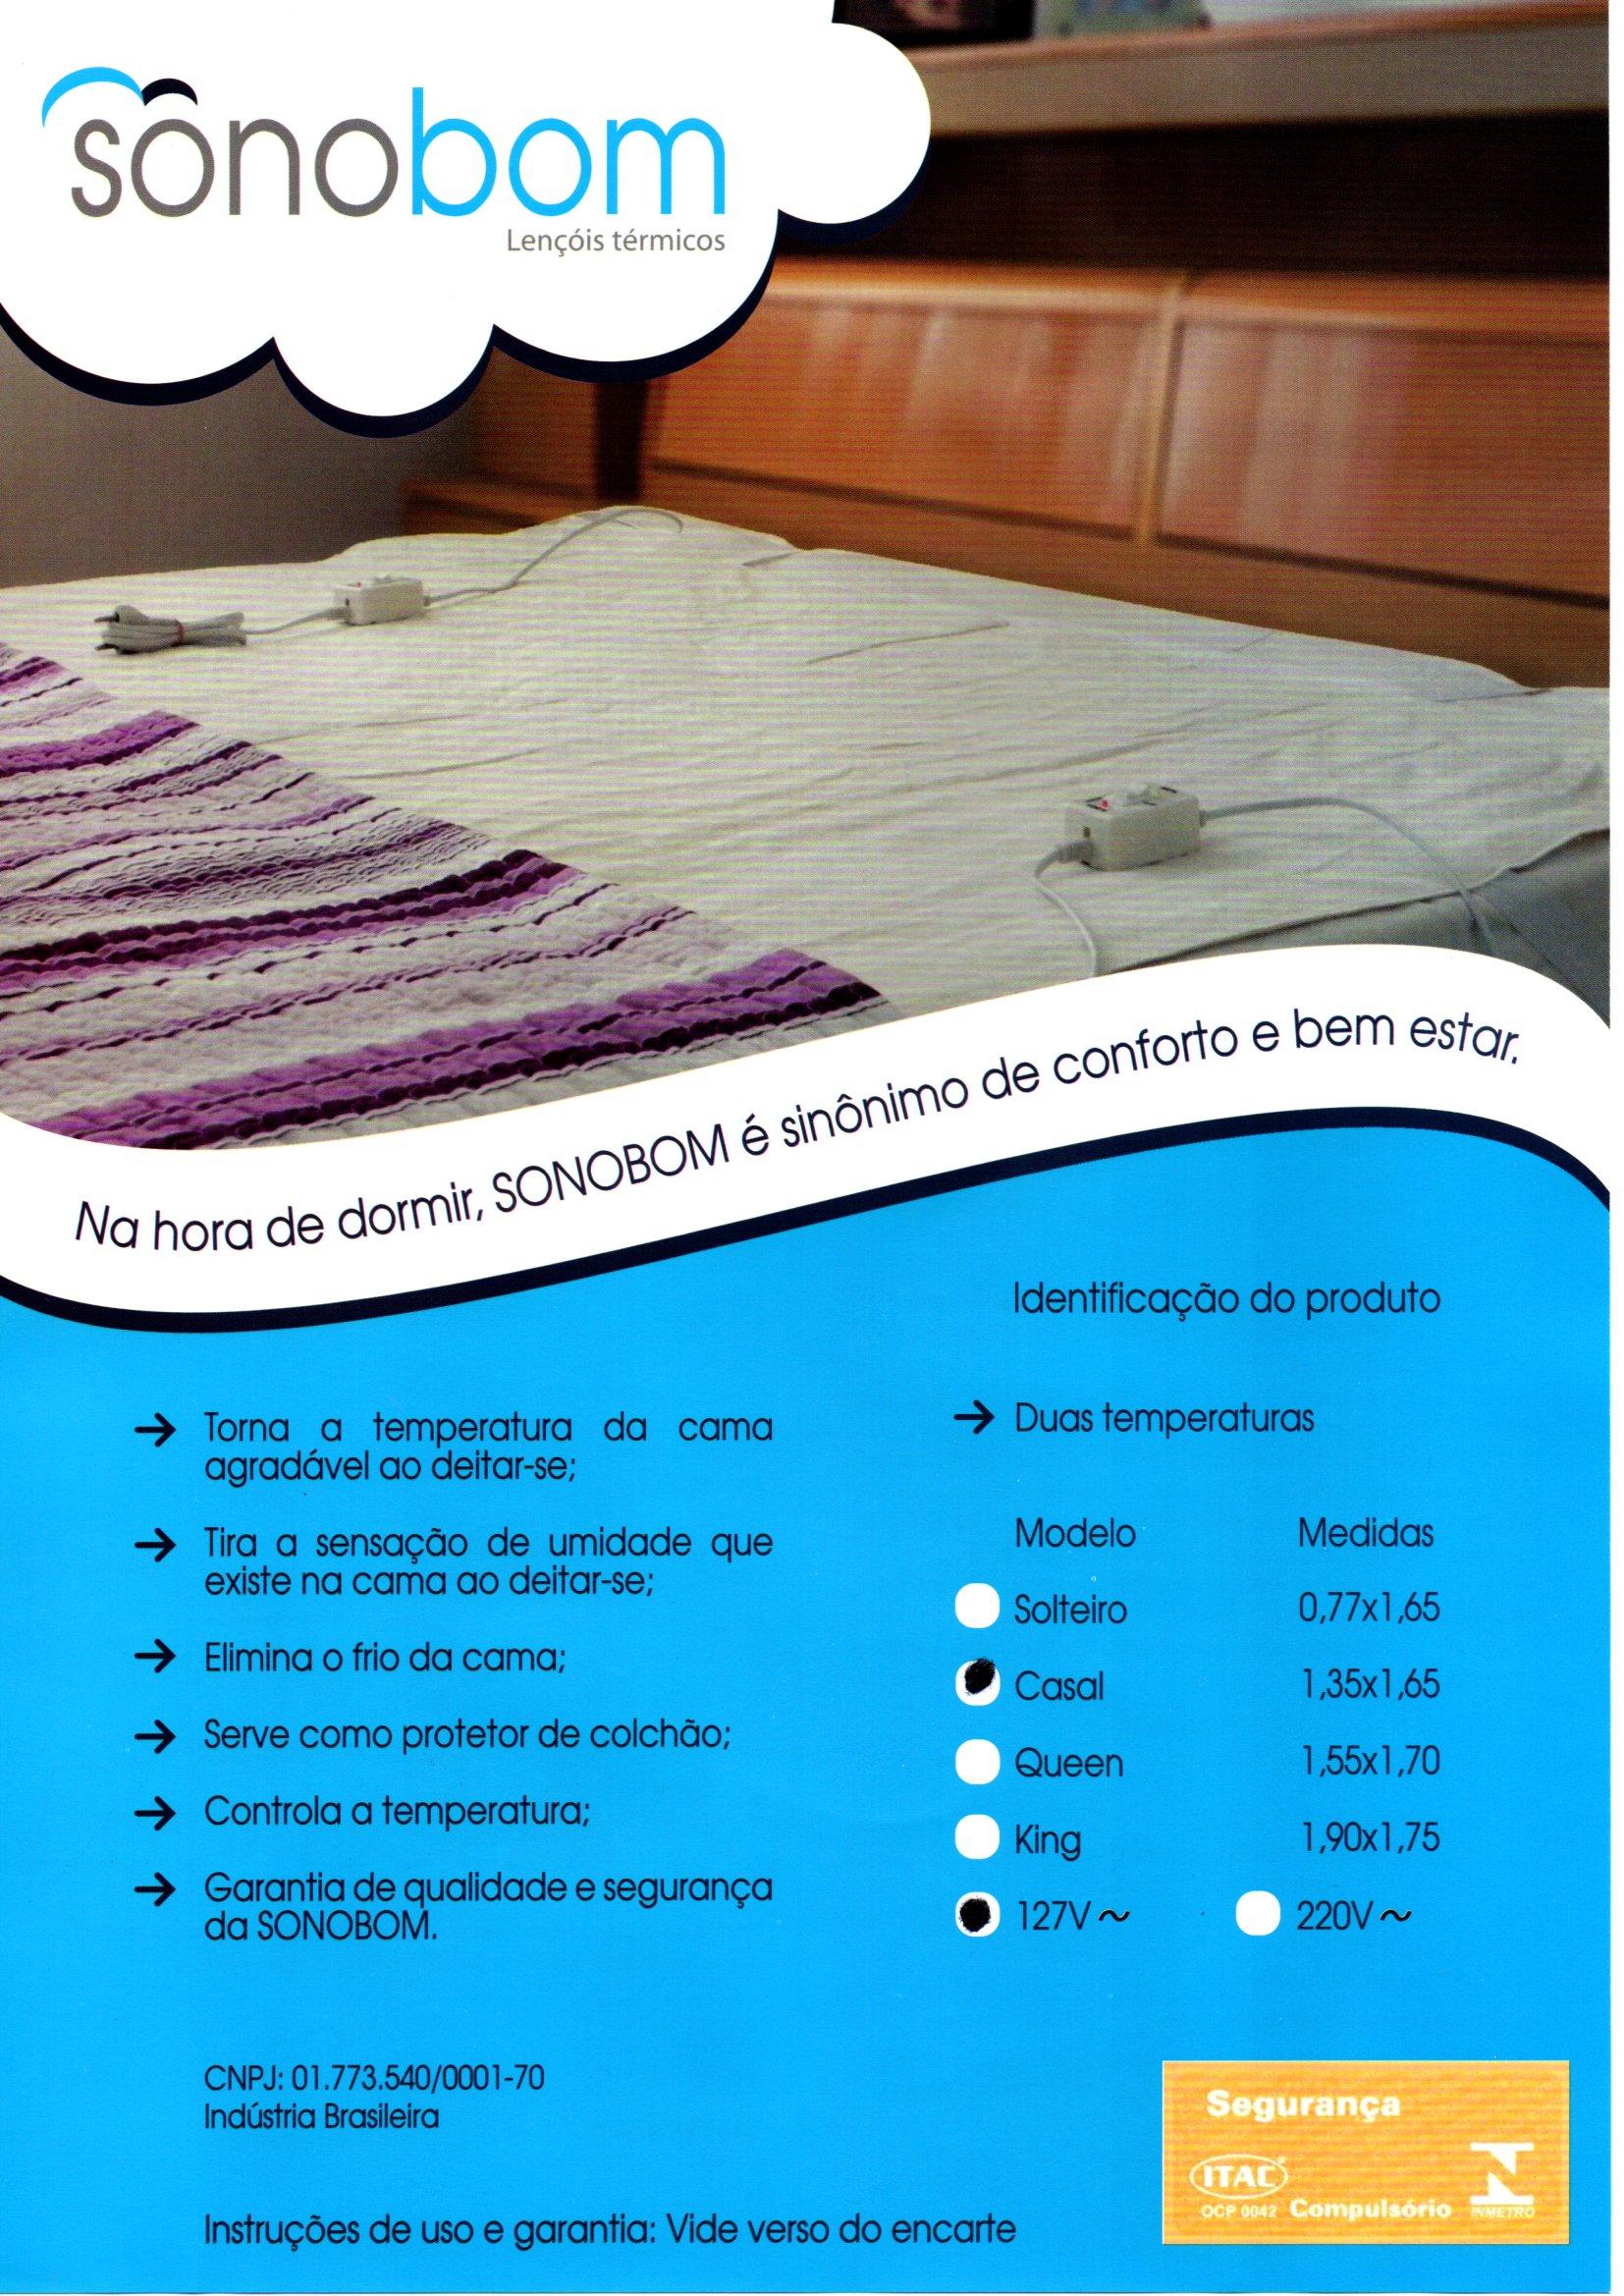 Polisani Materiais Médicos - LENCOL TERMICO CASAL 1,35X1,50 110V SONOBOM